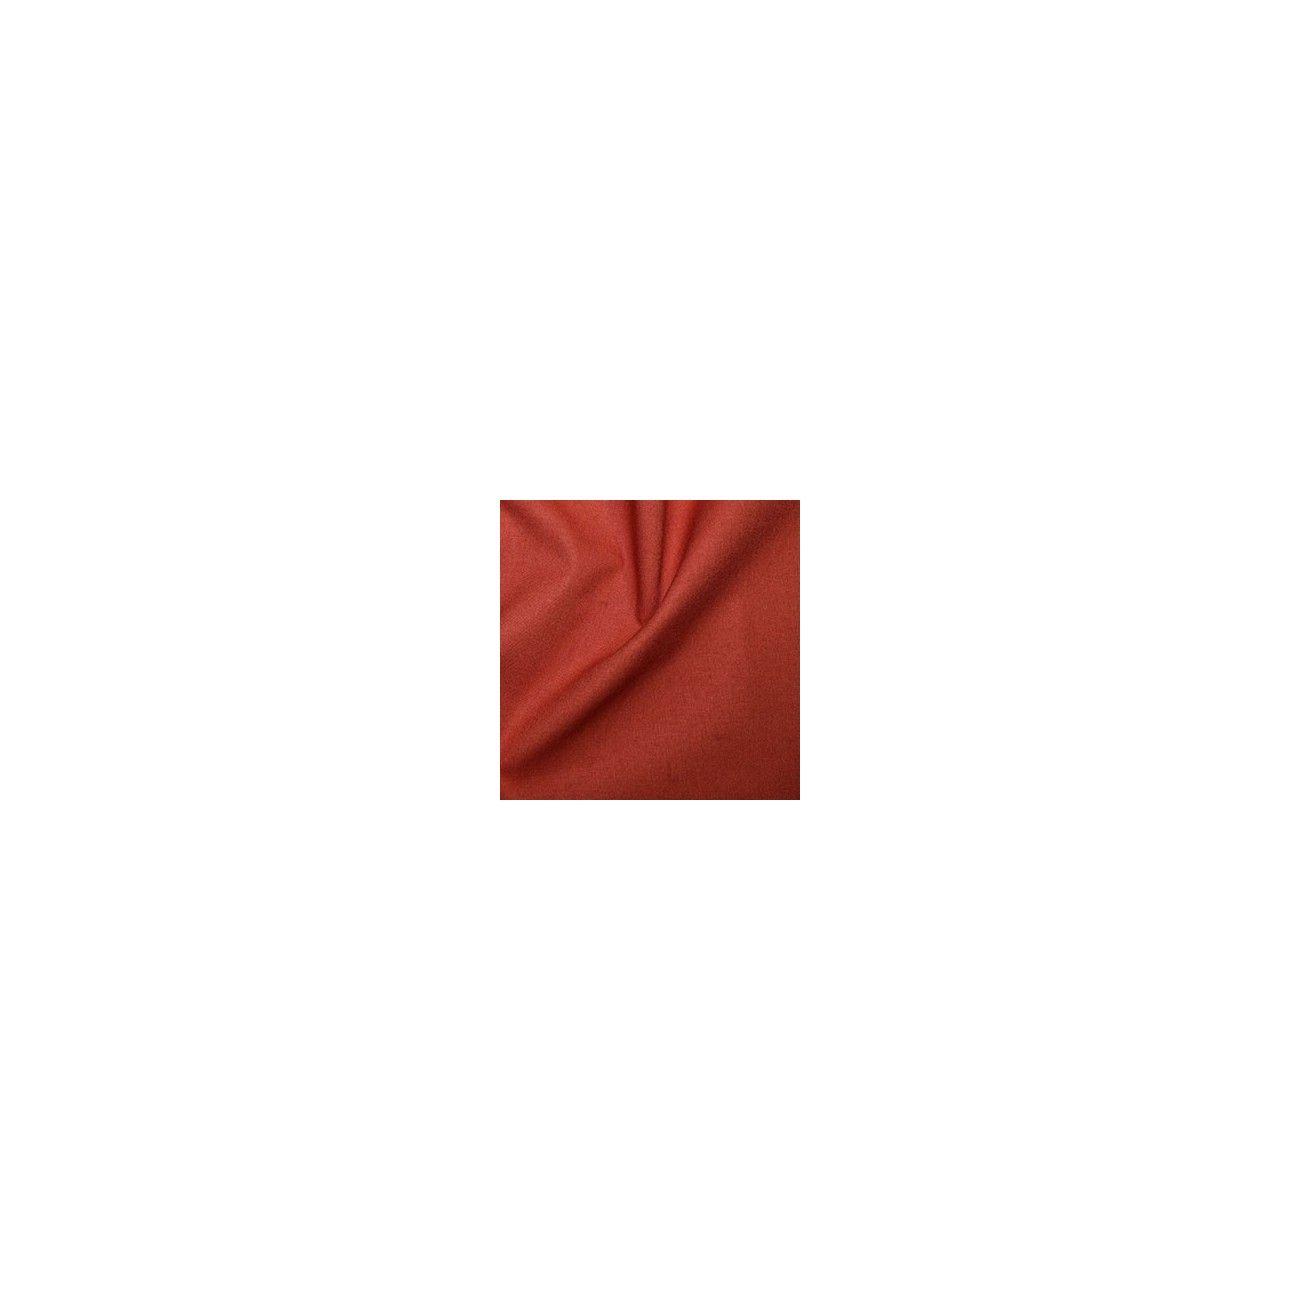 Tissu coton uni orange rouillée